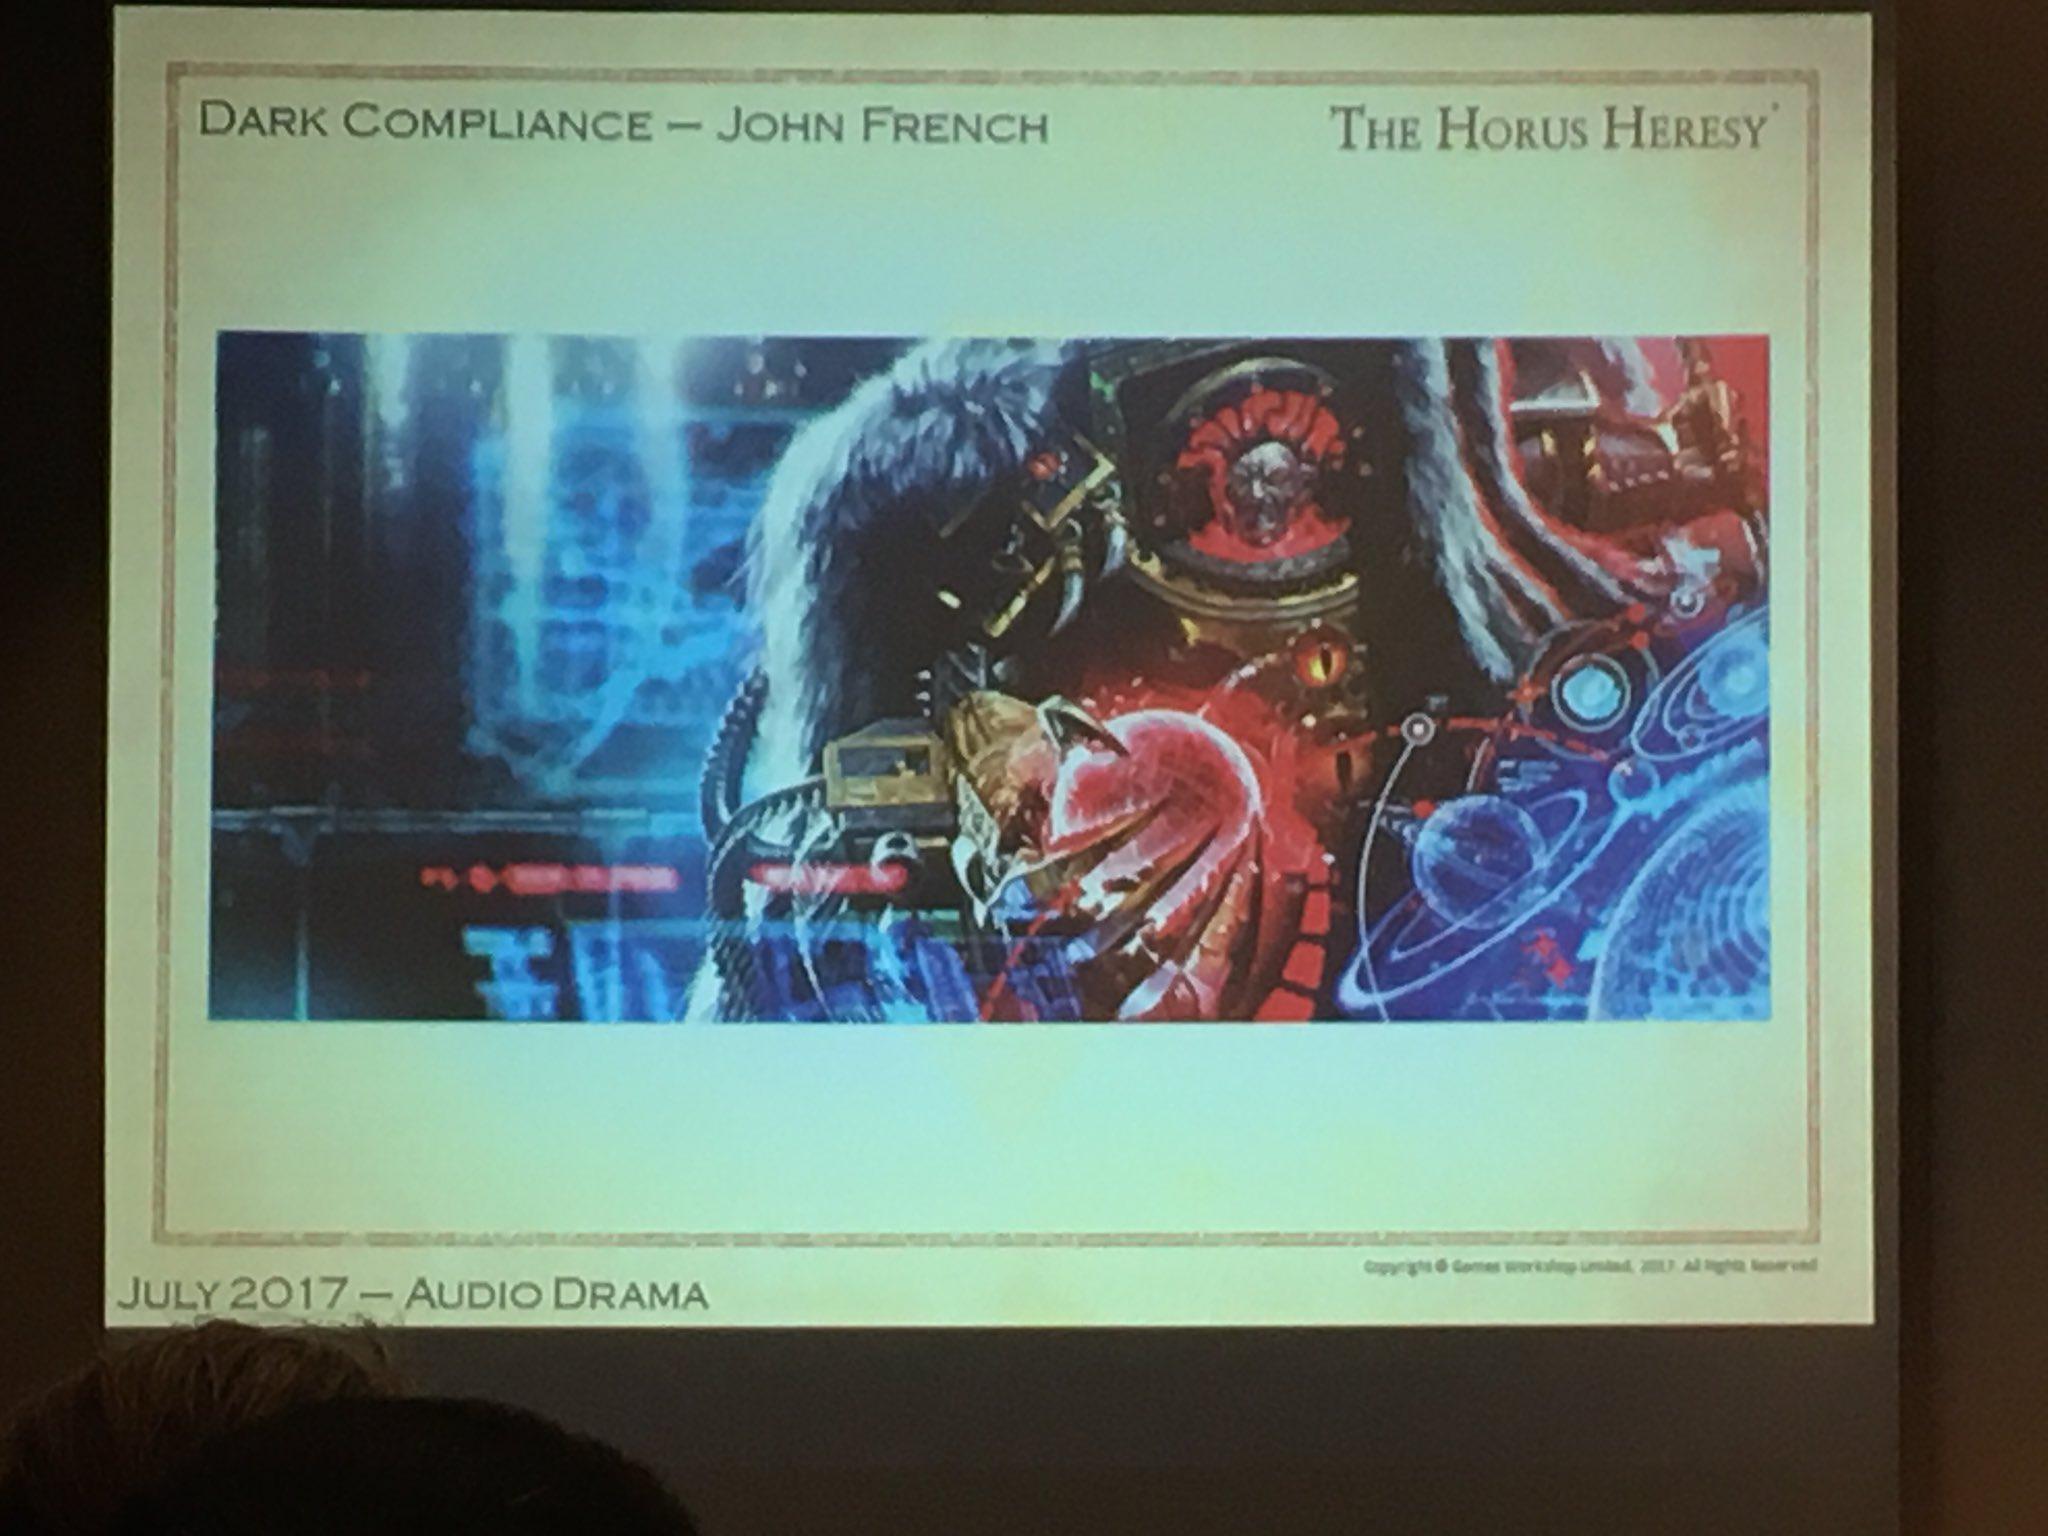 [The Horus Heresy Weekender 2017] - Centralisation des news 392834IMG20170204161902